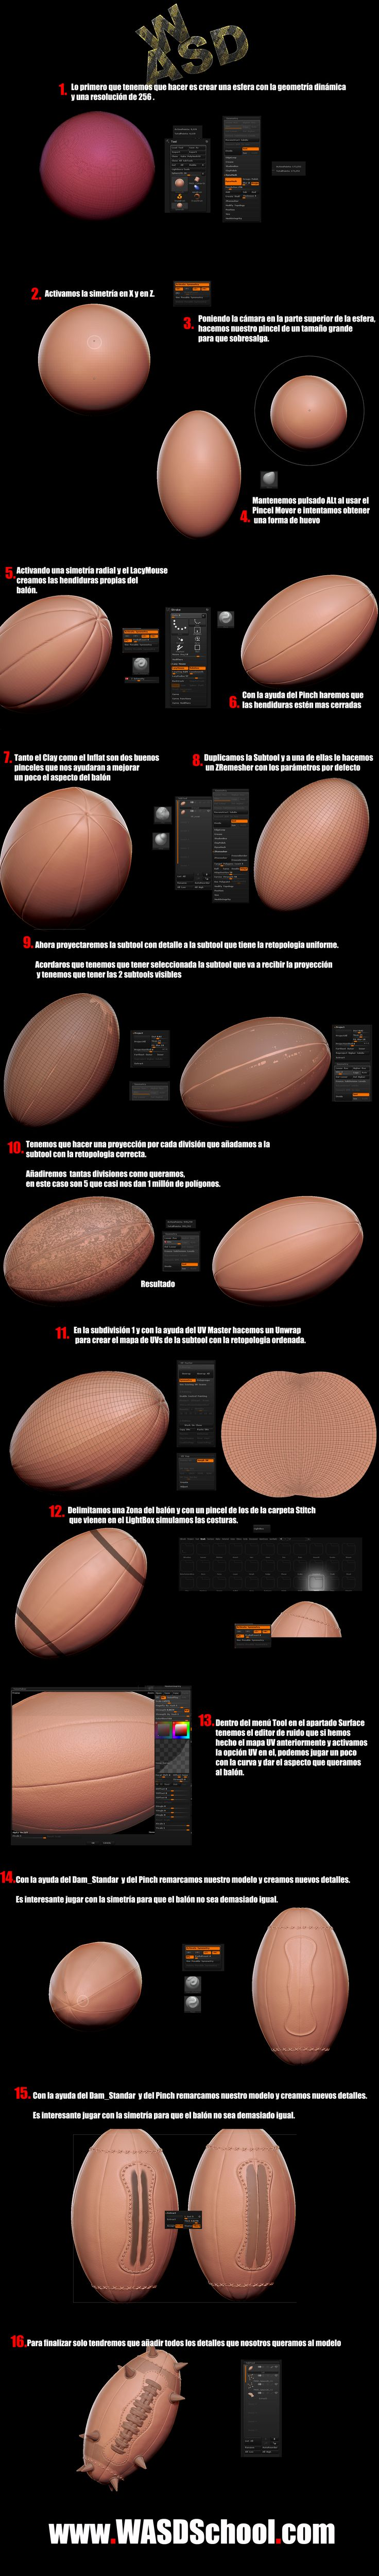 Ball Zbrush tutorial by WASDschool